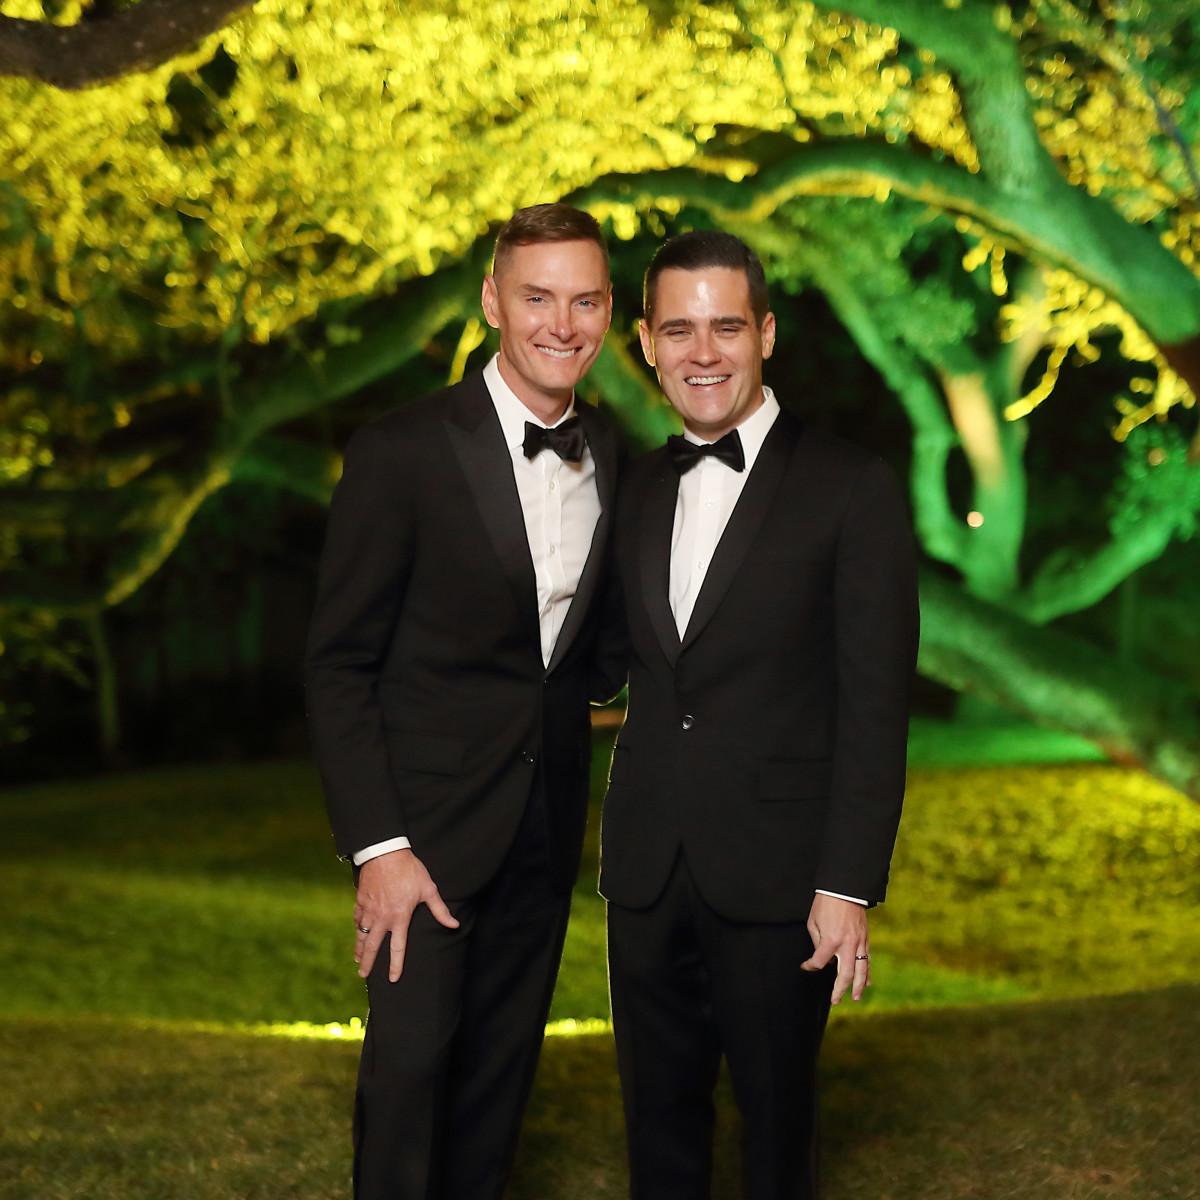 Real wedding Houston Ryan Korsgard Marshall Eudy